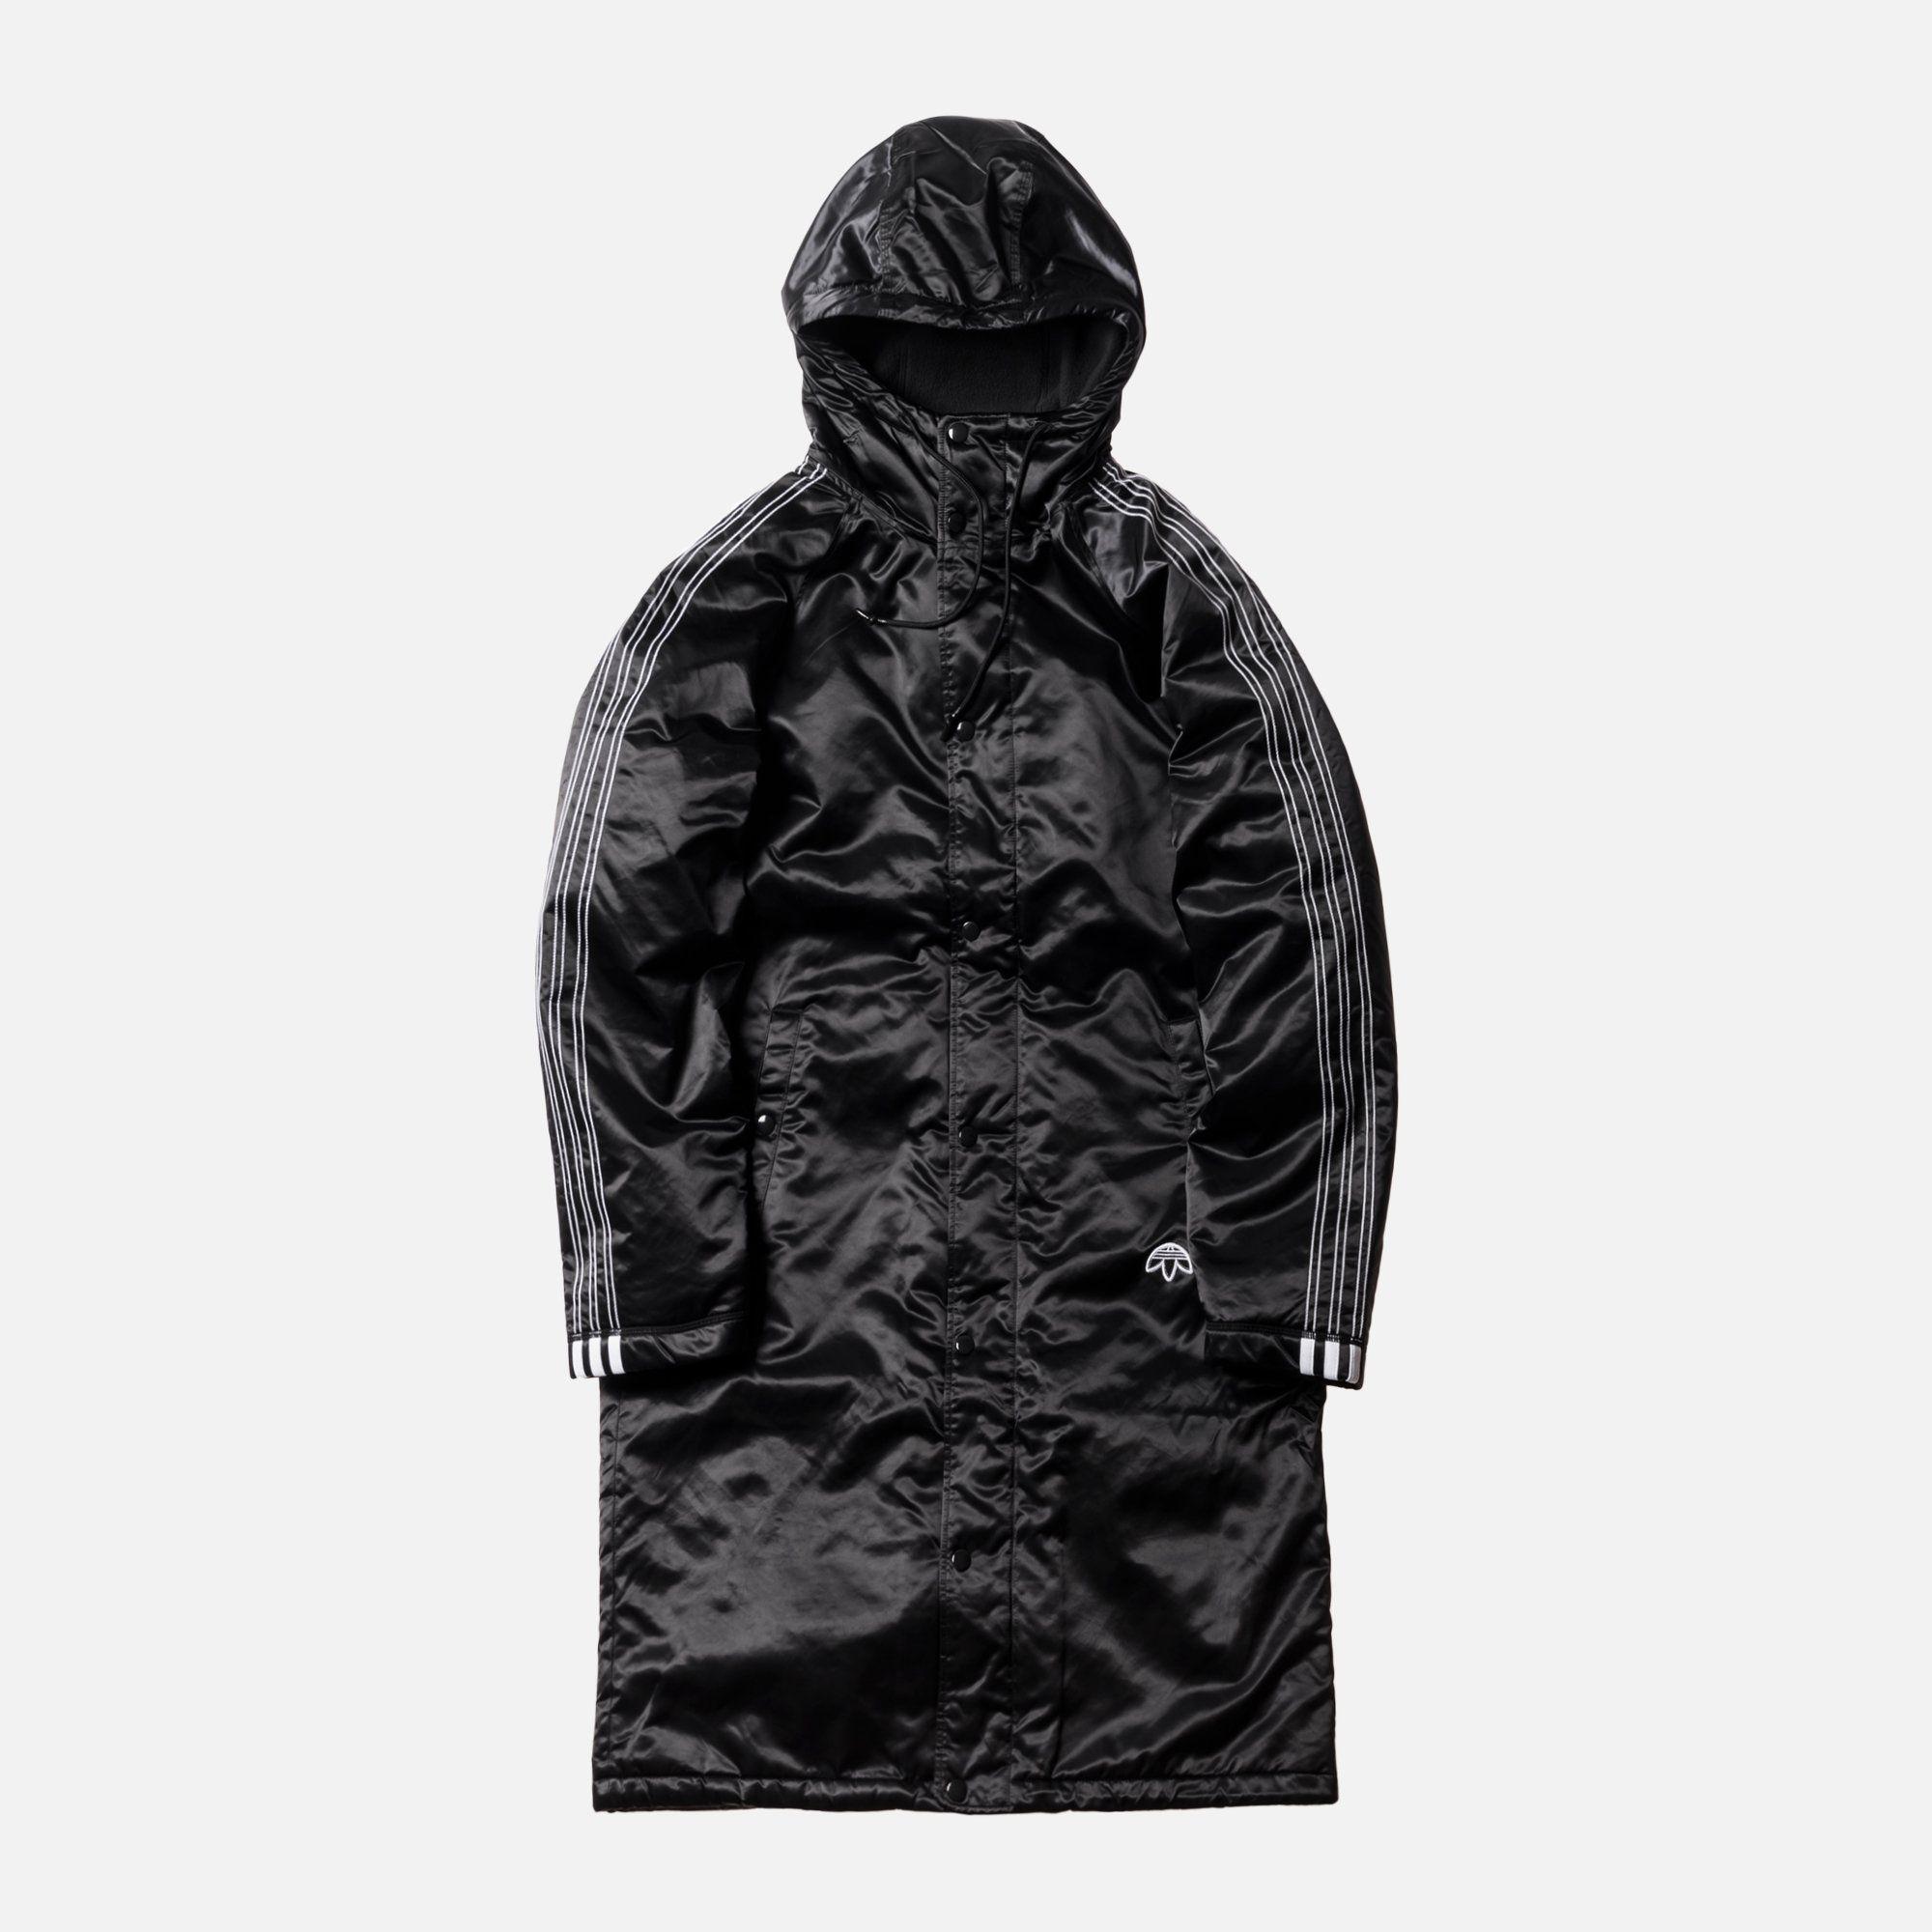 a735bf44c9b1 adidas Originals by Alexander Wang Stadium Jacket - Black - XS